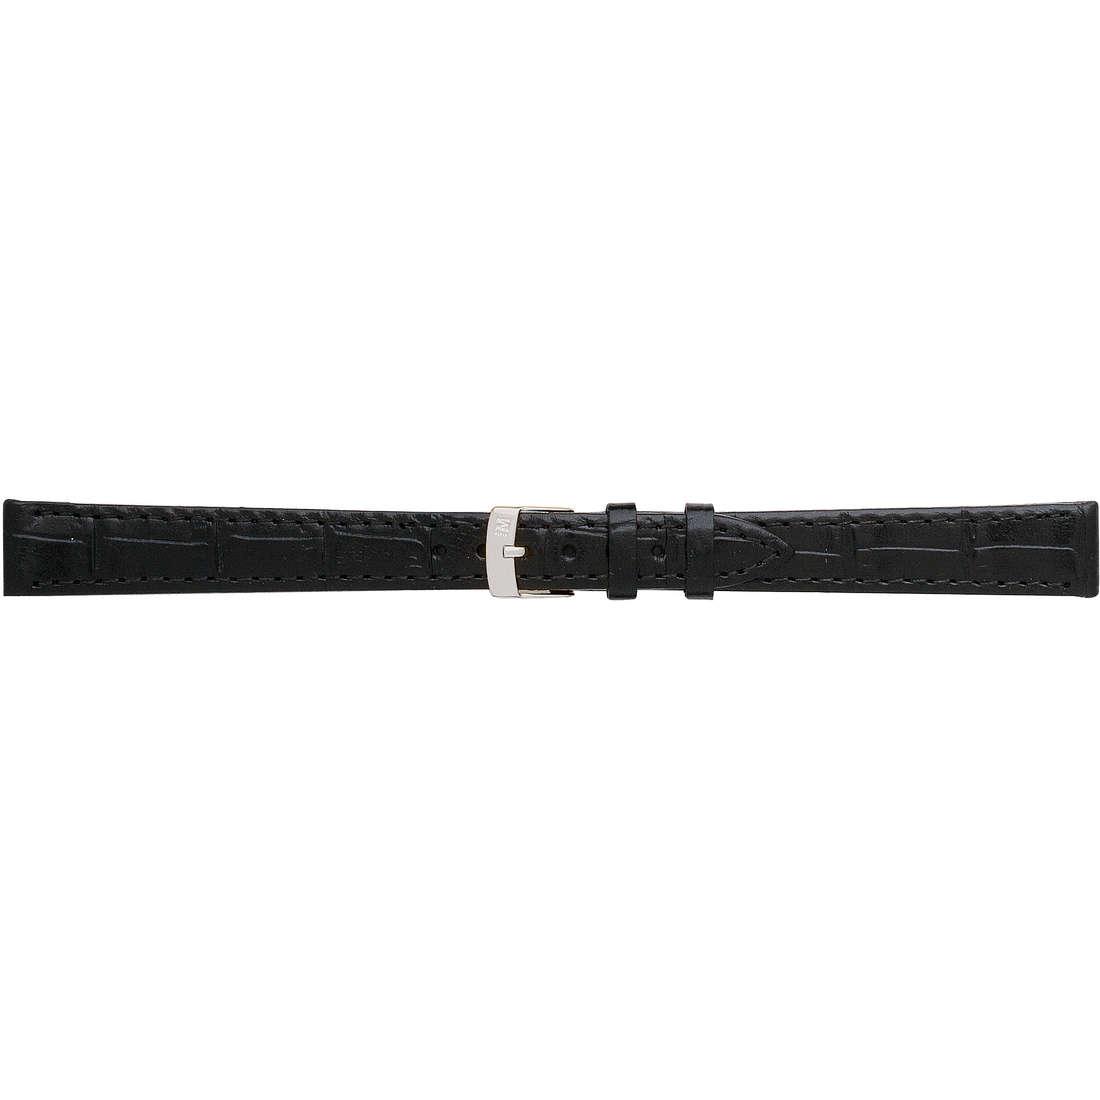 watch watch bands watch straps unisex Morellato I Lunghi A01Y2524656019CR12